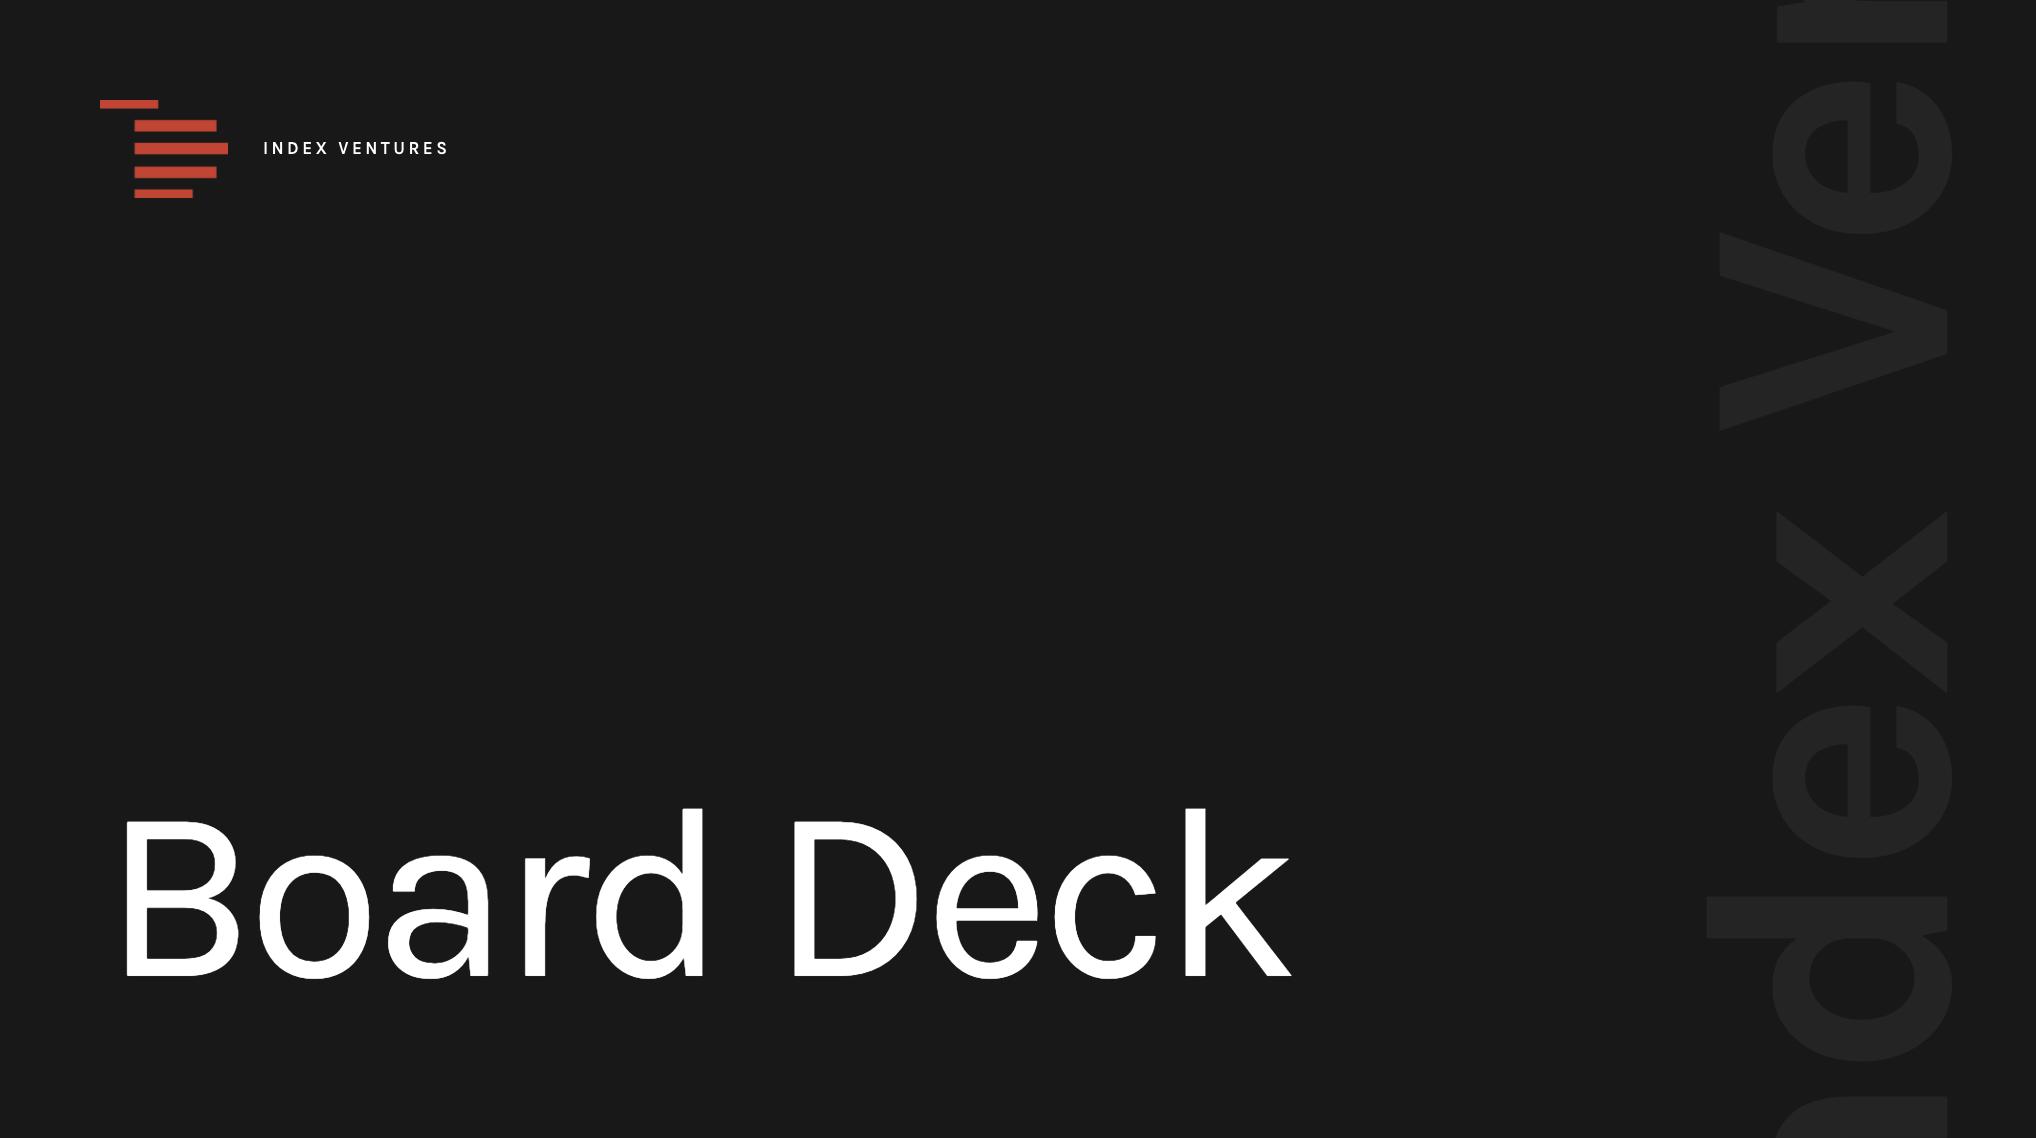 Board deck by Index Ventures